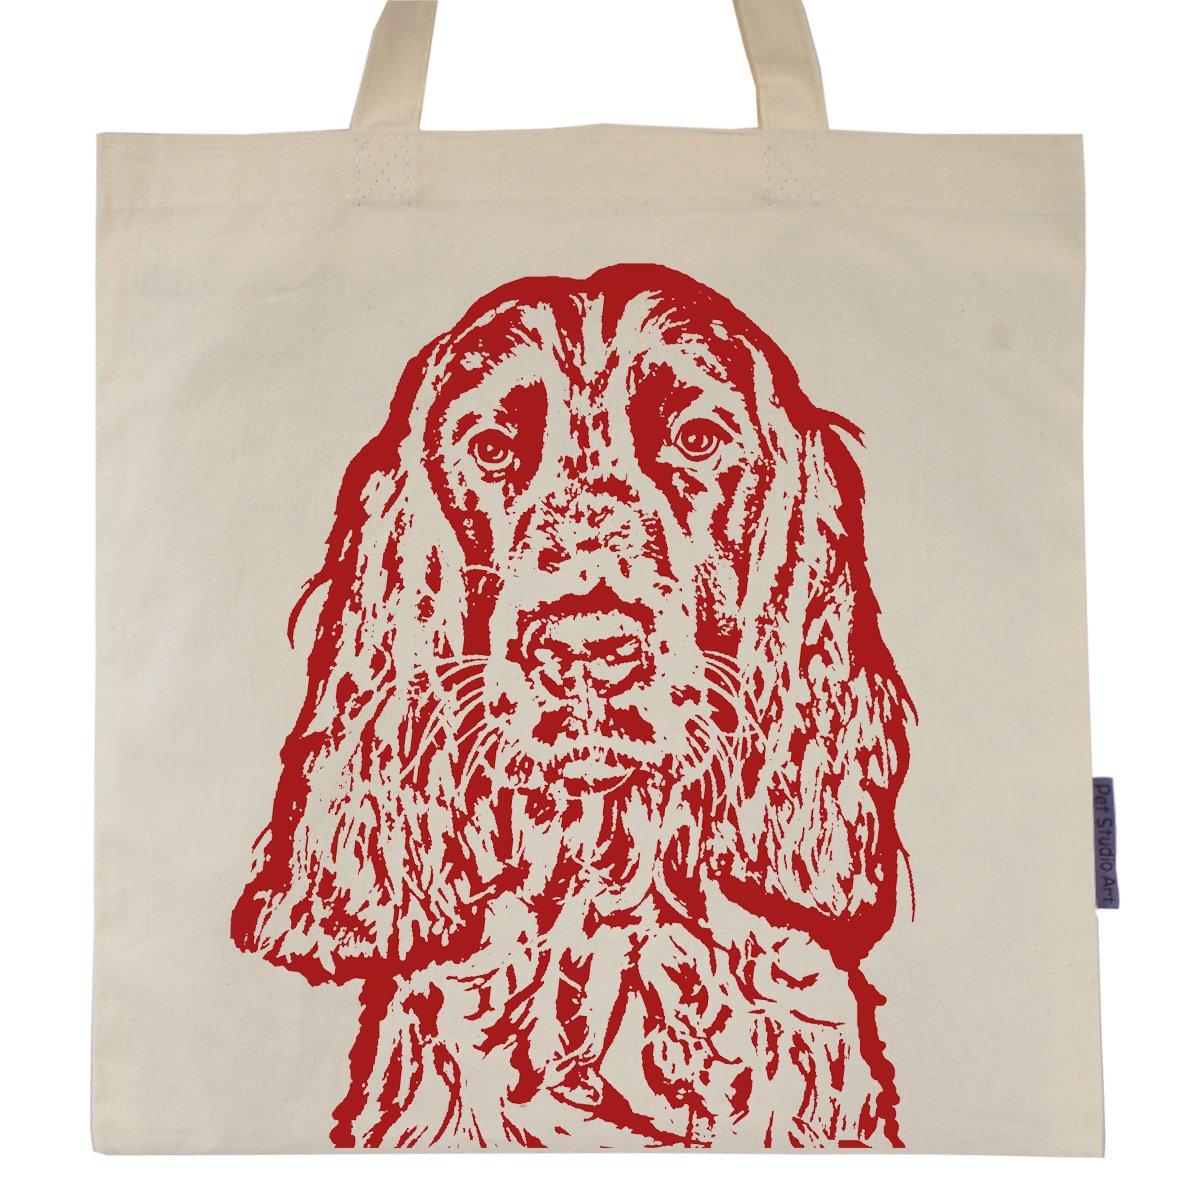 Springer Spaniel named Big Red Tote Bag